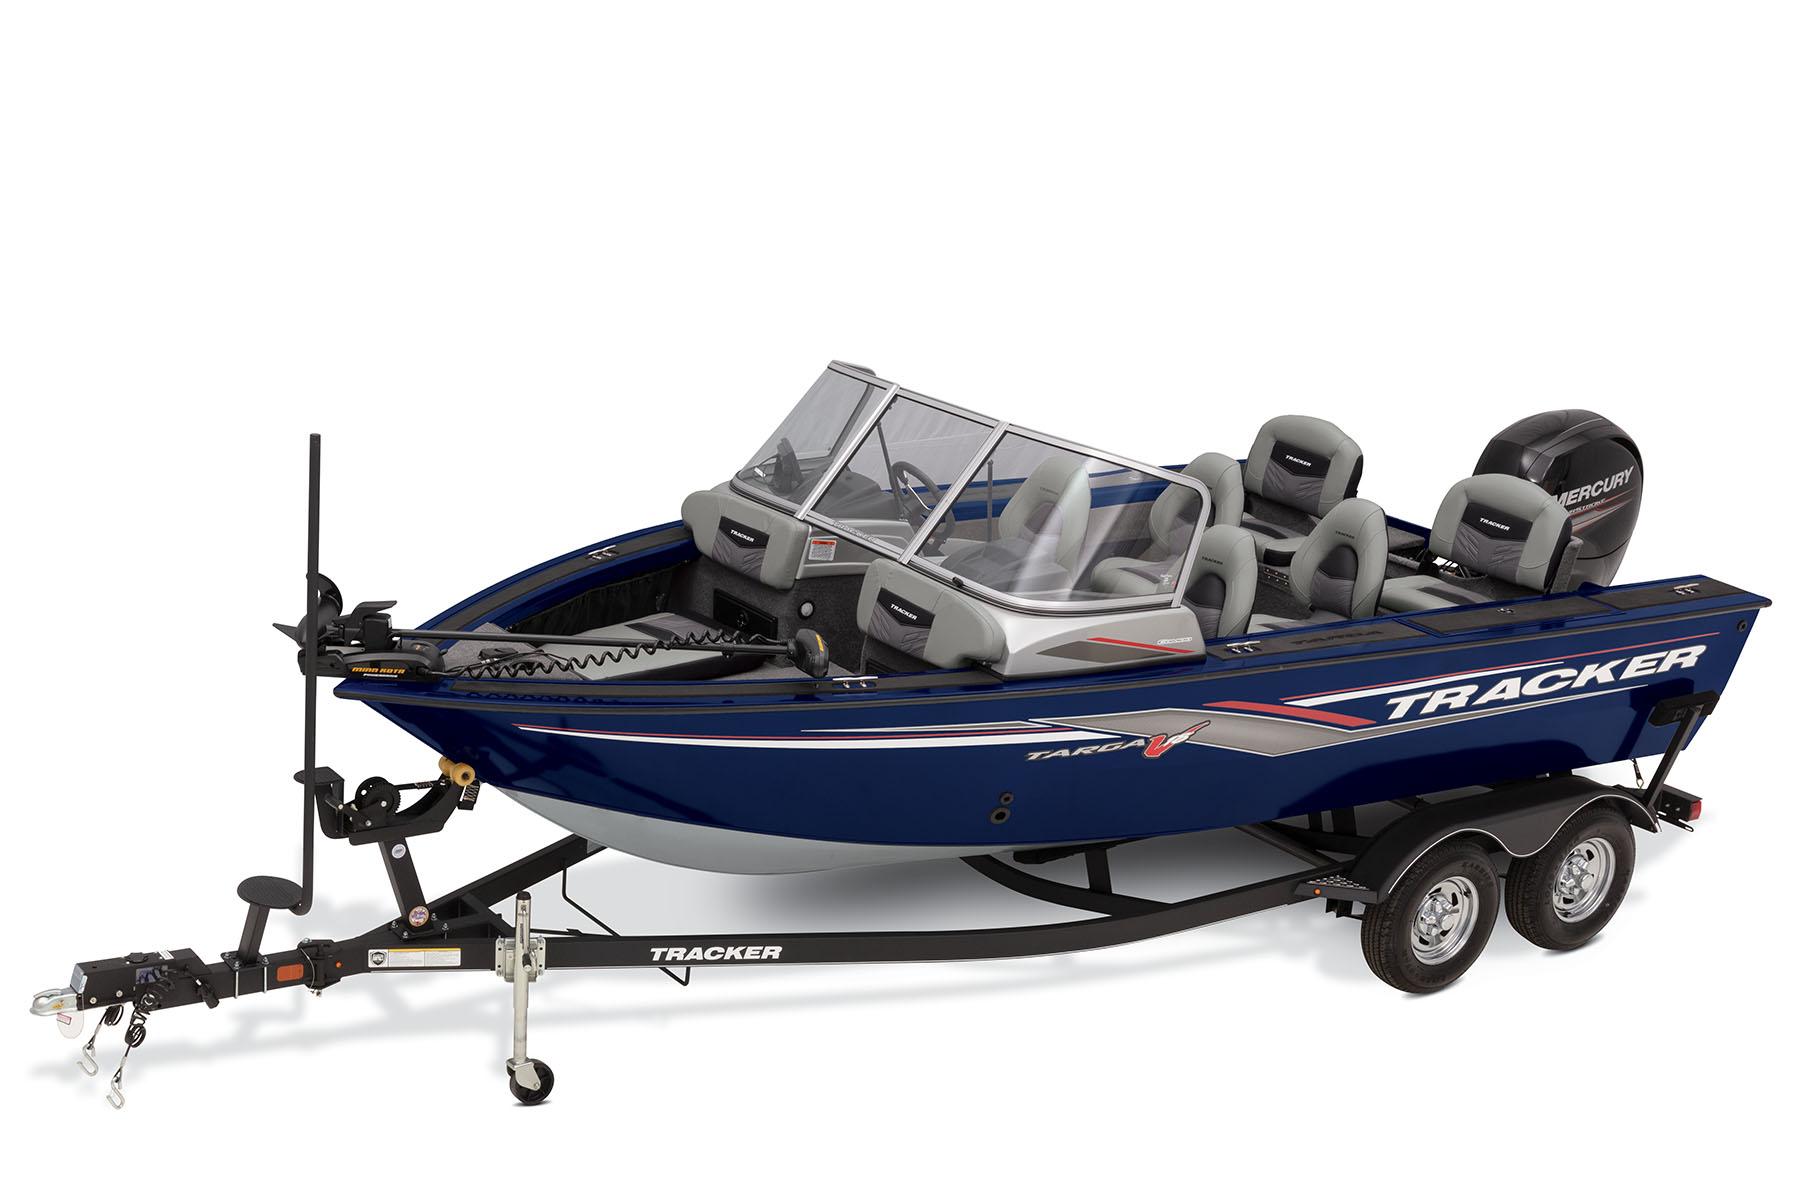 [SCHEMATICS_43NM]  2019 TARGA V-18 Combo - TRACKER Deep V Multi-Species Boat   2015 Tracker Targa Electrical Wiring Diagram      Tracker Boats